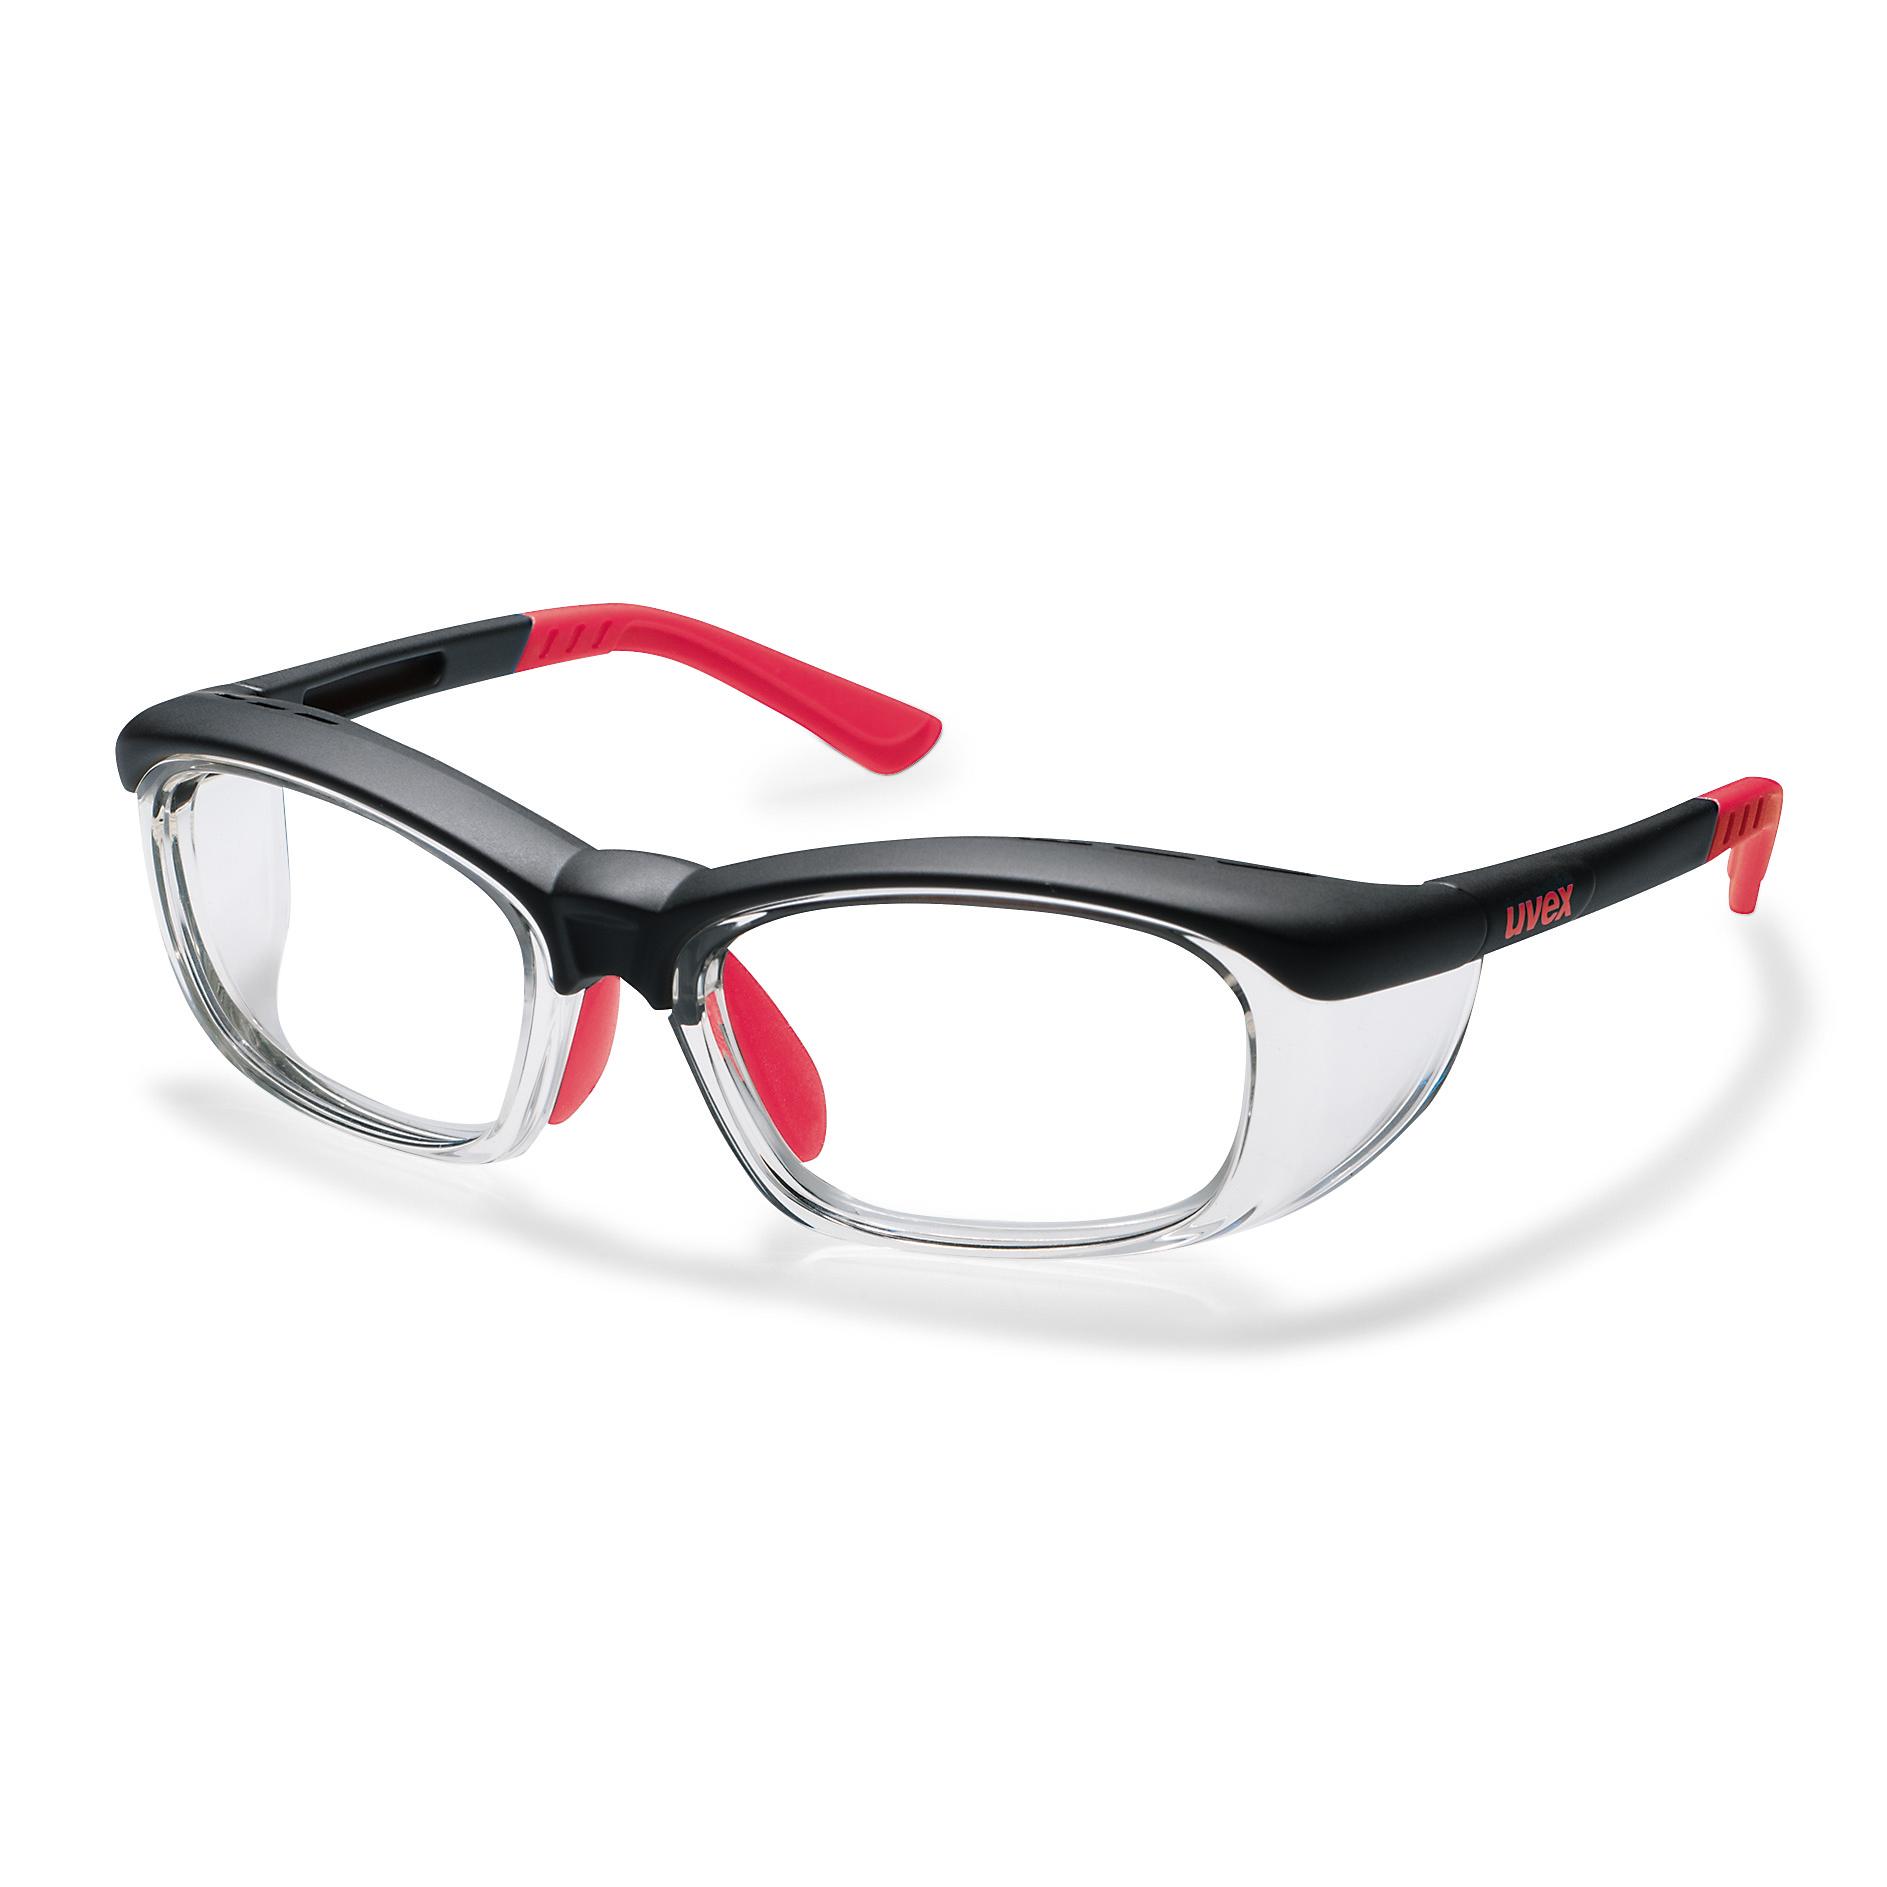 70d0d4c7ec35 uvex RX cd 5514 prescription safety spectacles   uvex safety